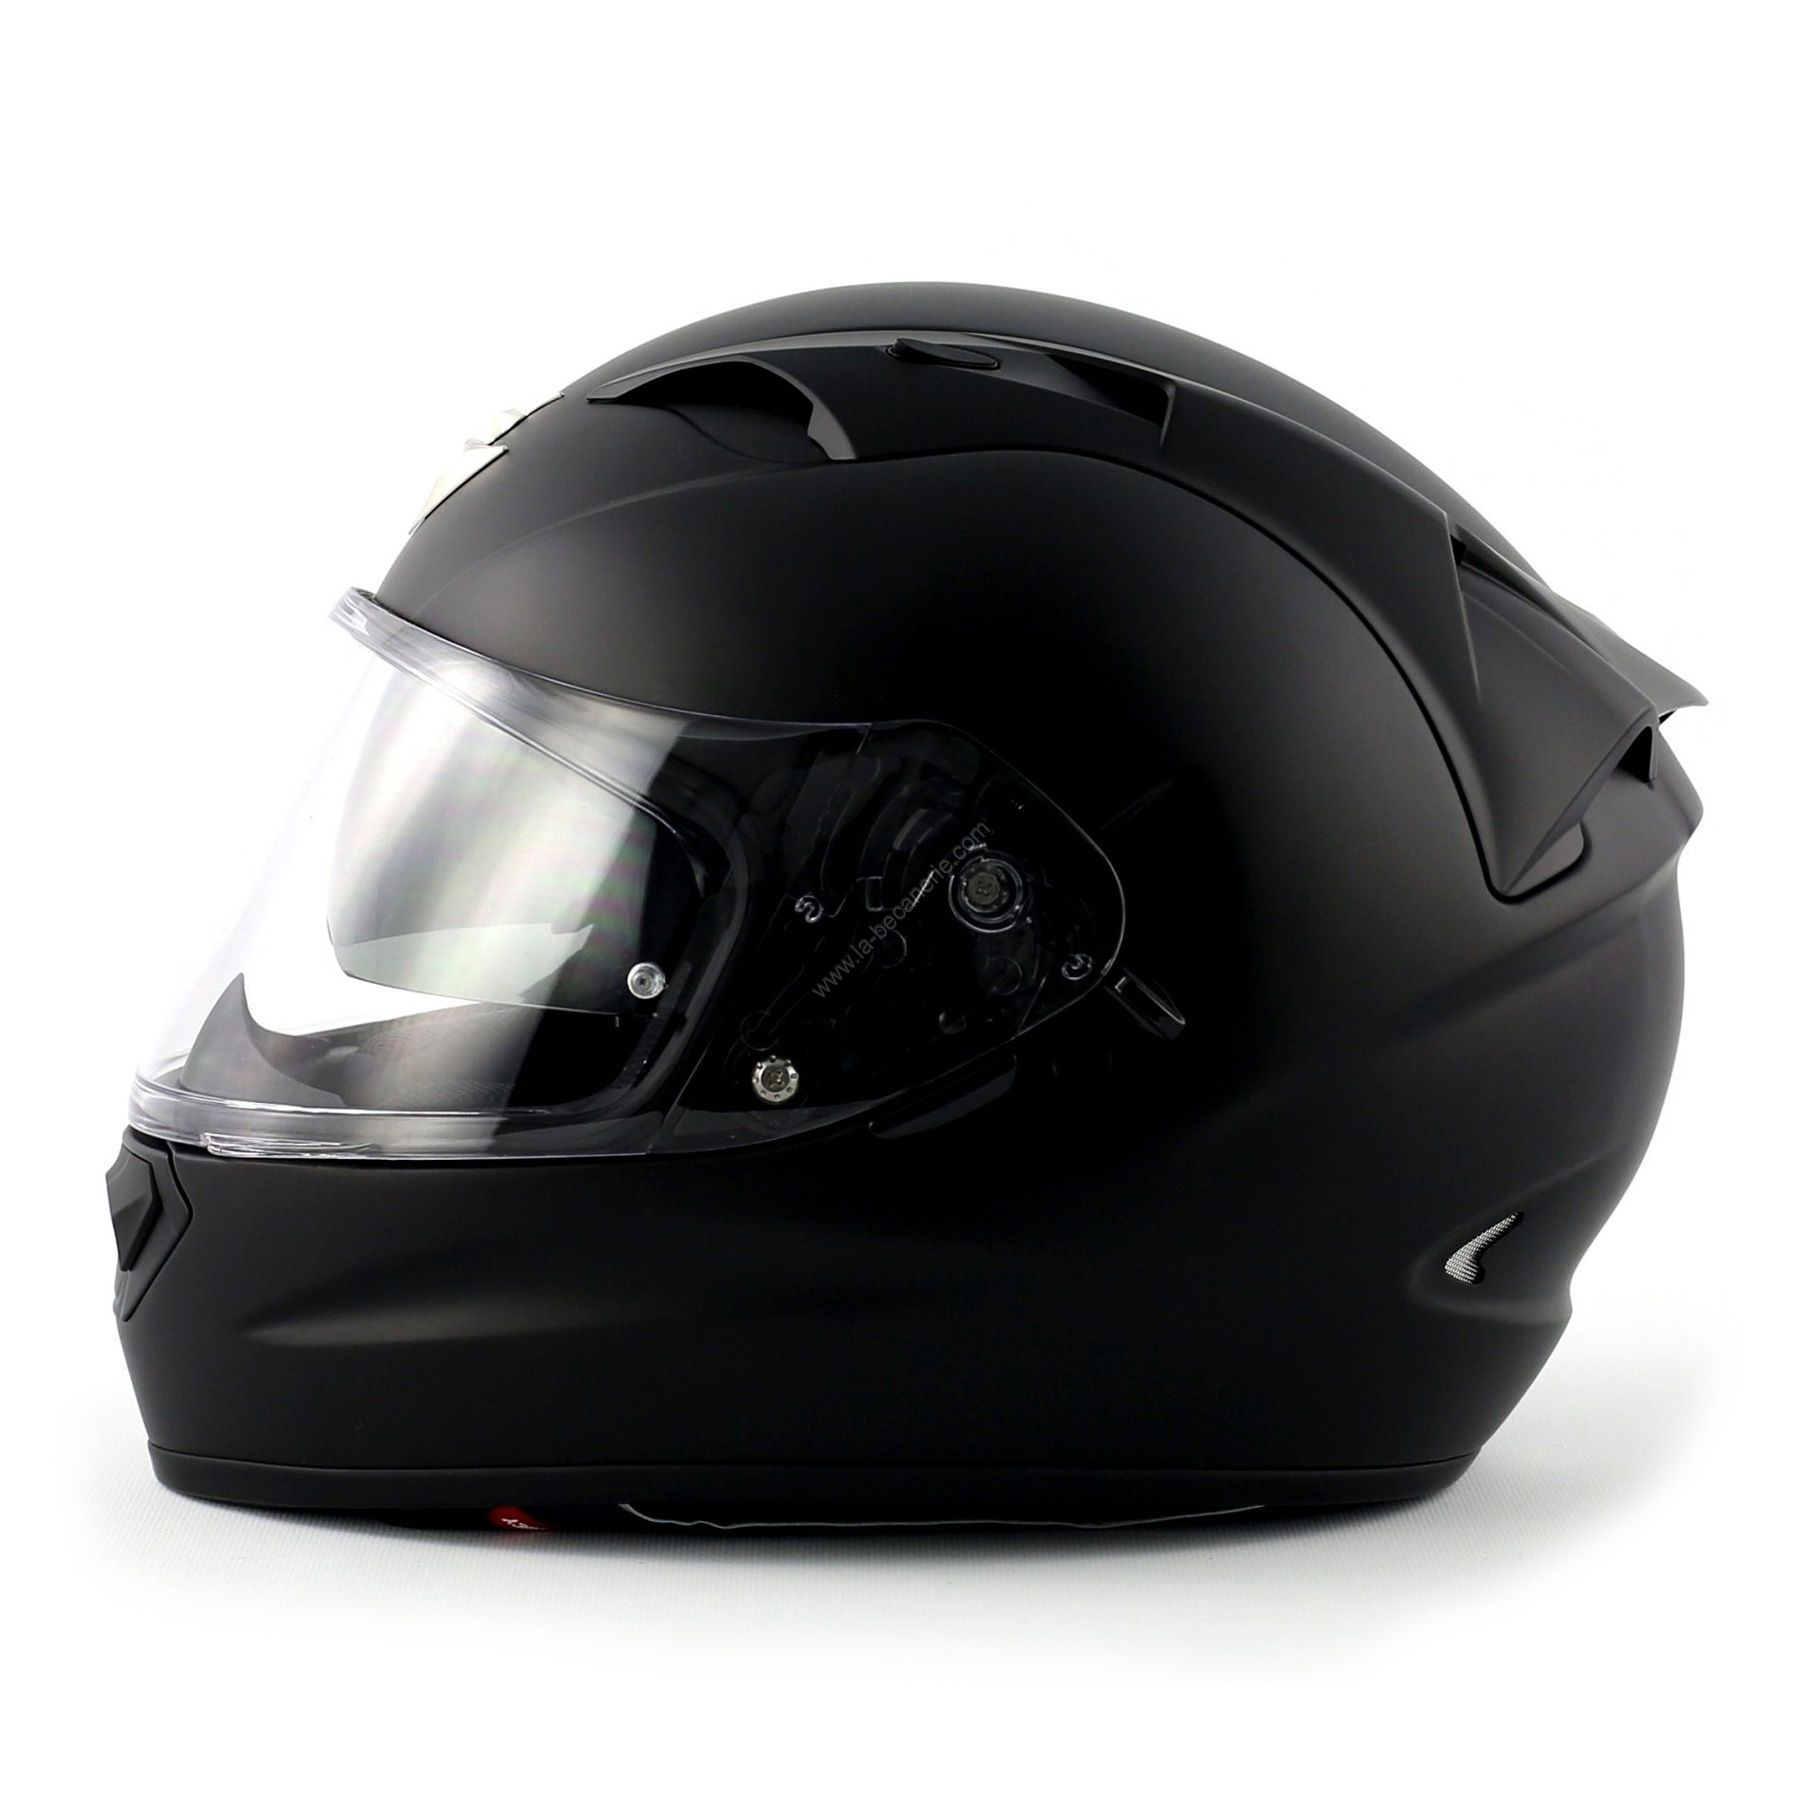 casque moto et scooter int gral jet modulable la. Black Bedroom Furniture Sets. Home Design Ideas